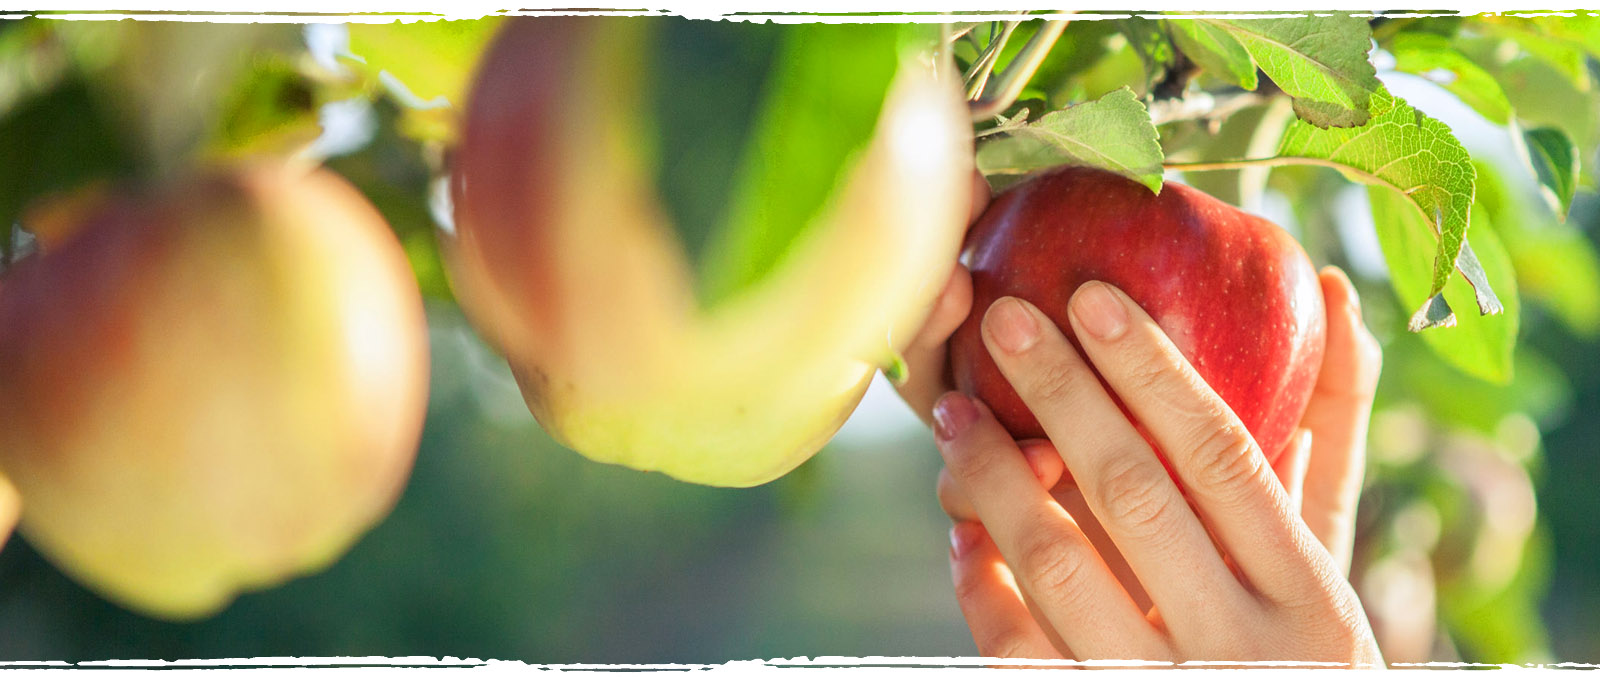 Selbstgepflückte Äpfel